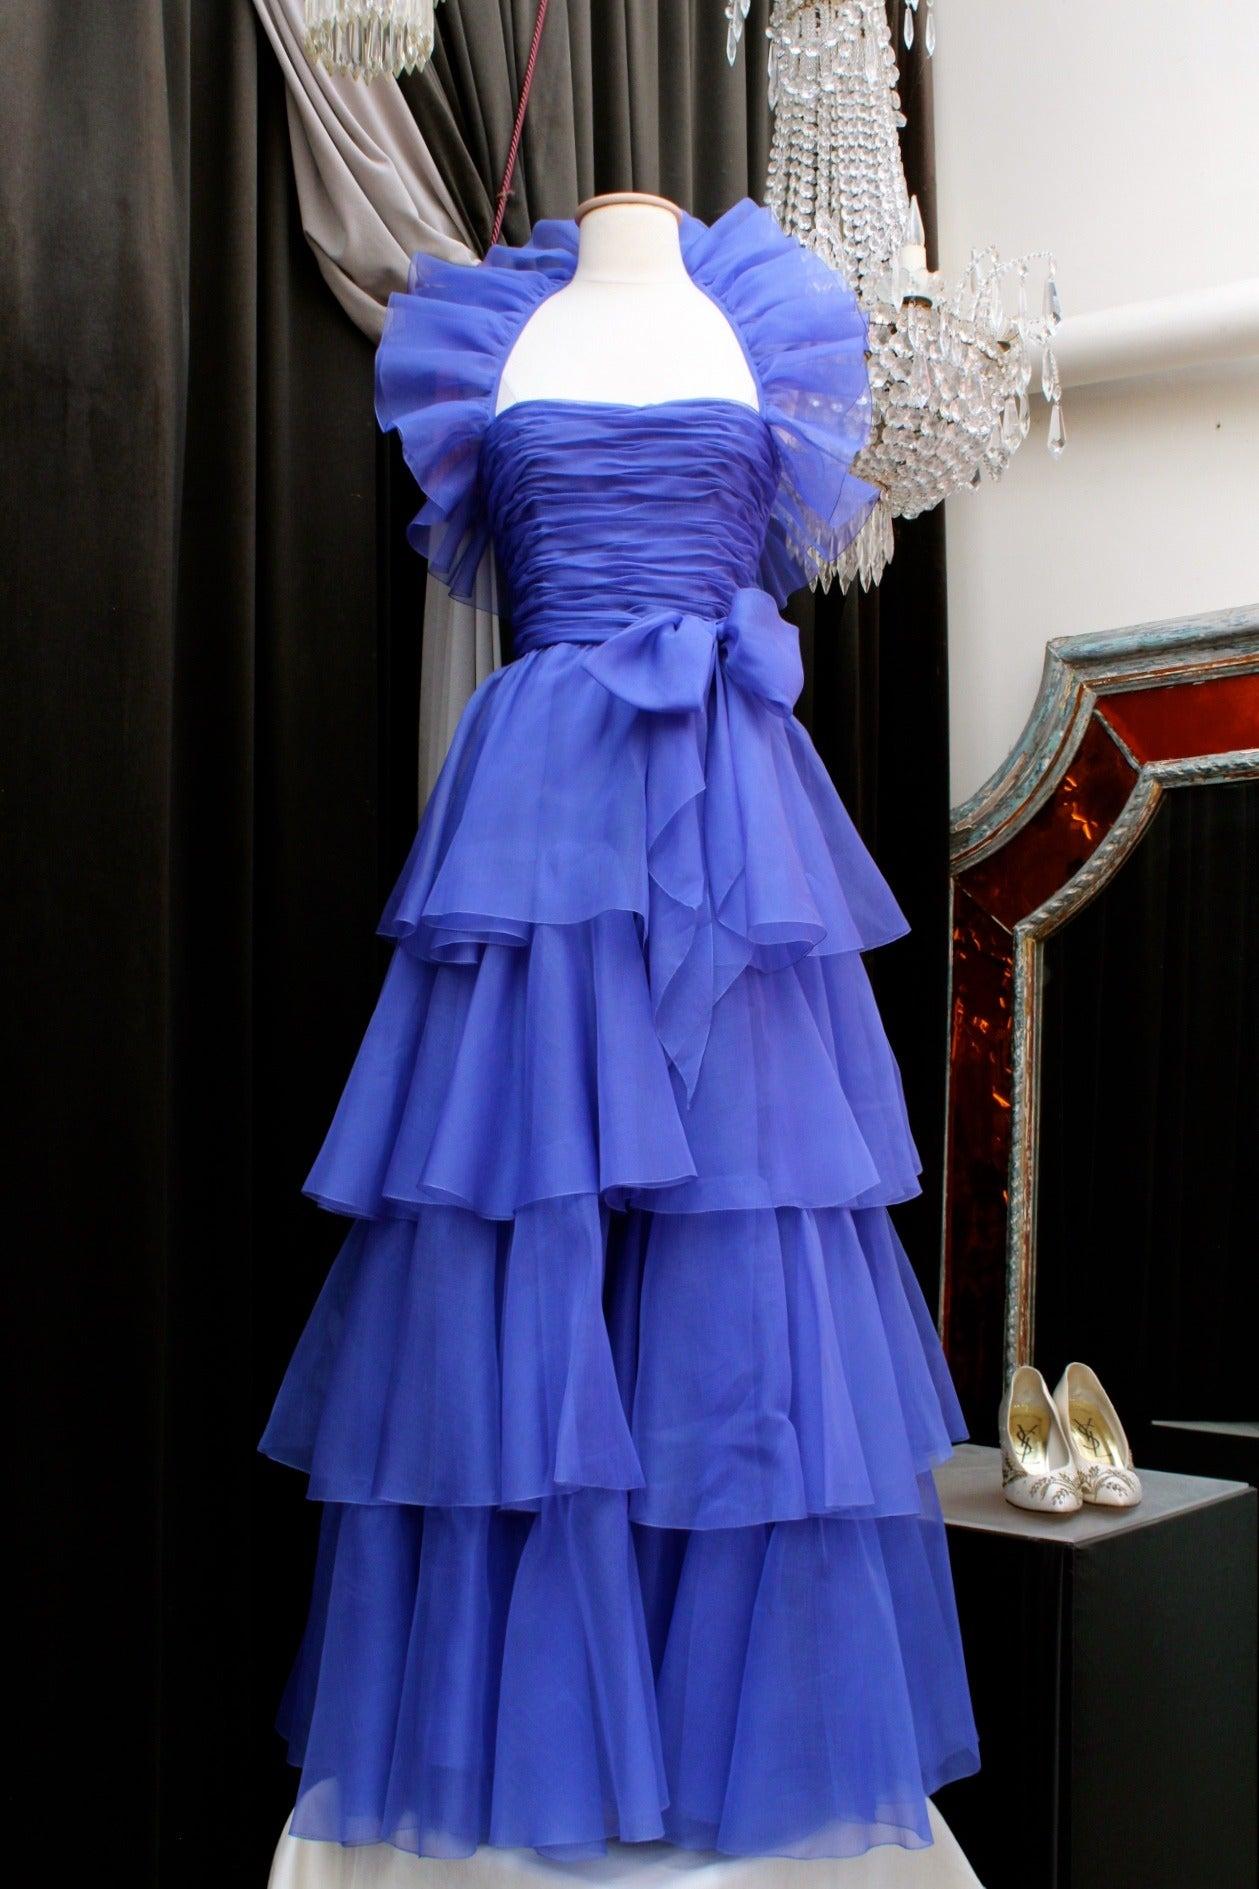 Jean-Louis Scherrer Haute Couture Blue Organza Evening Gown, 1980s  2